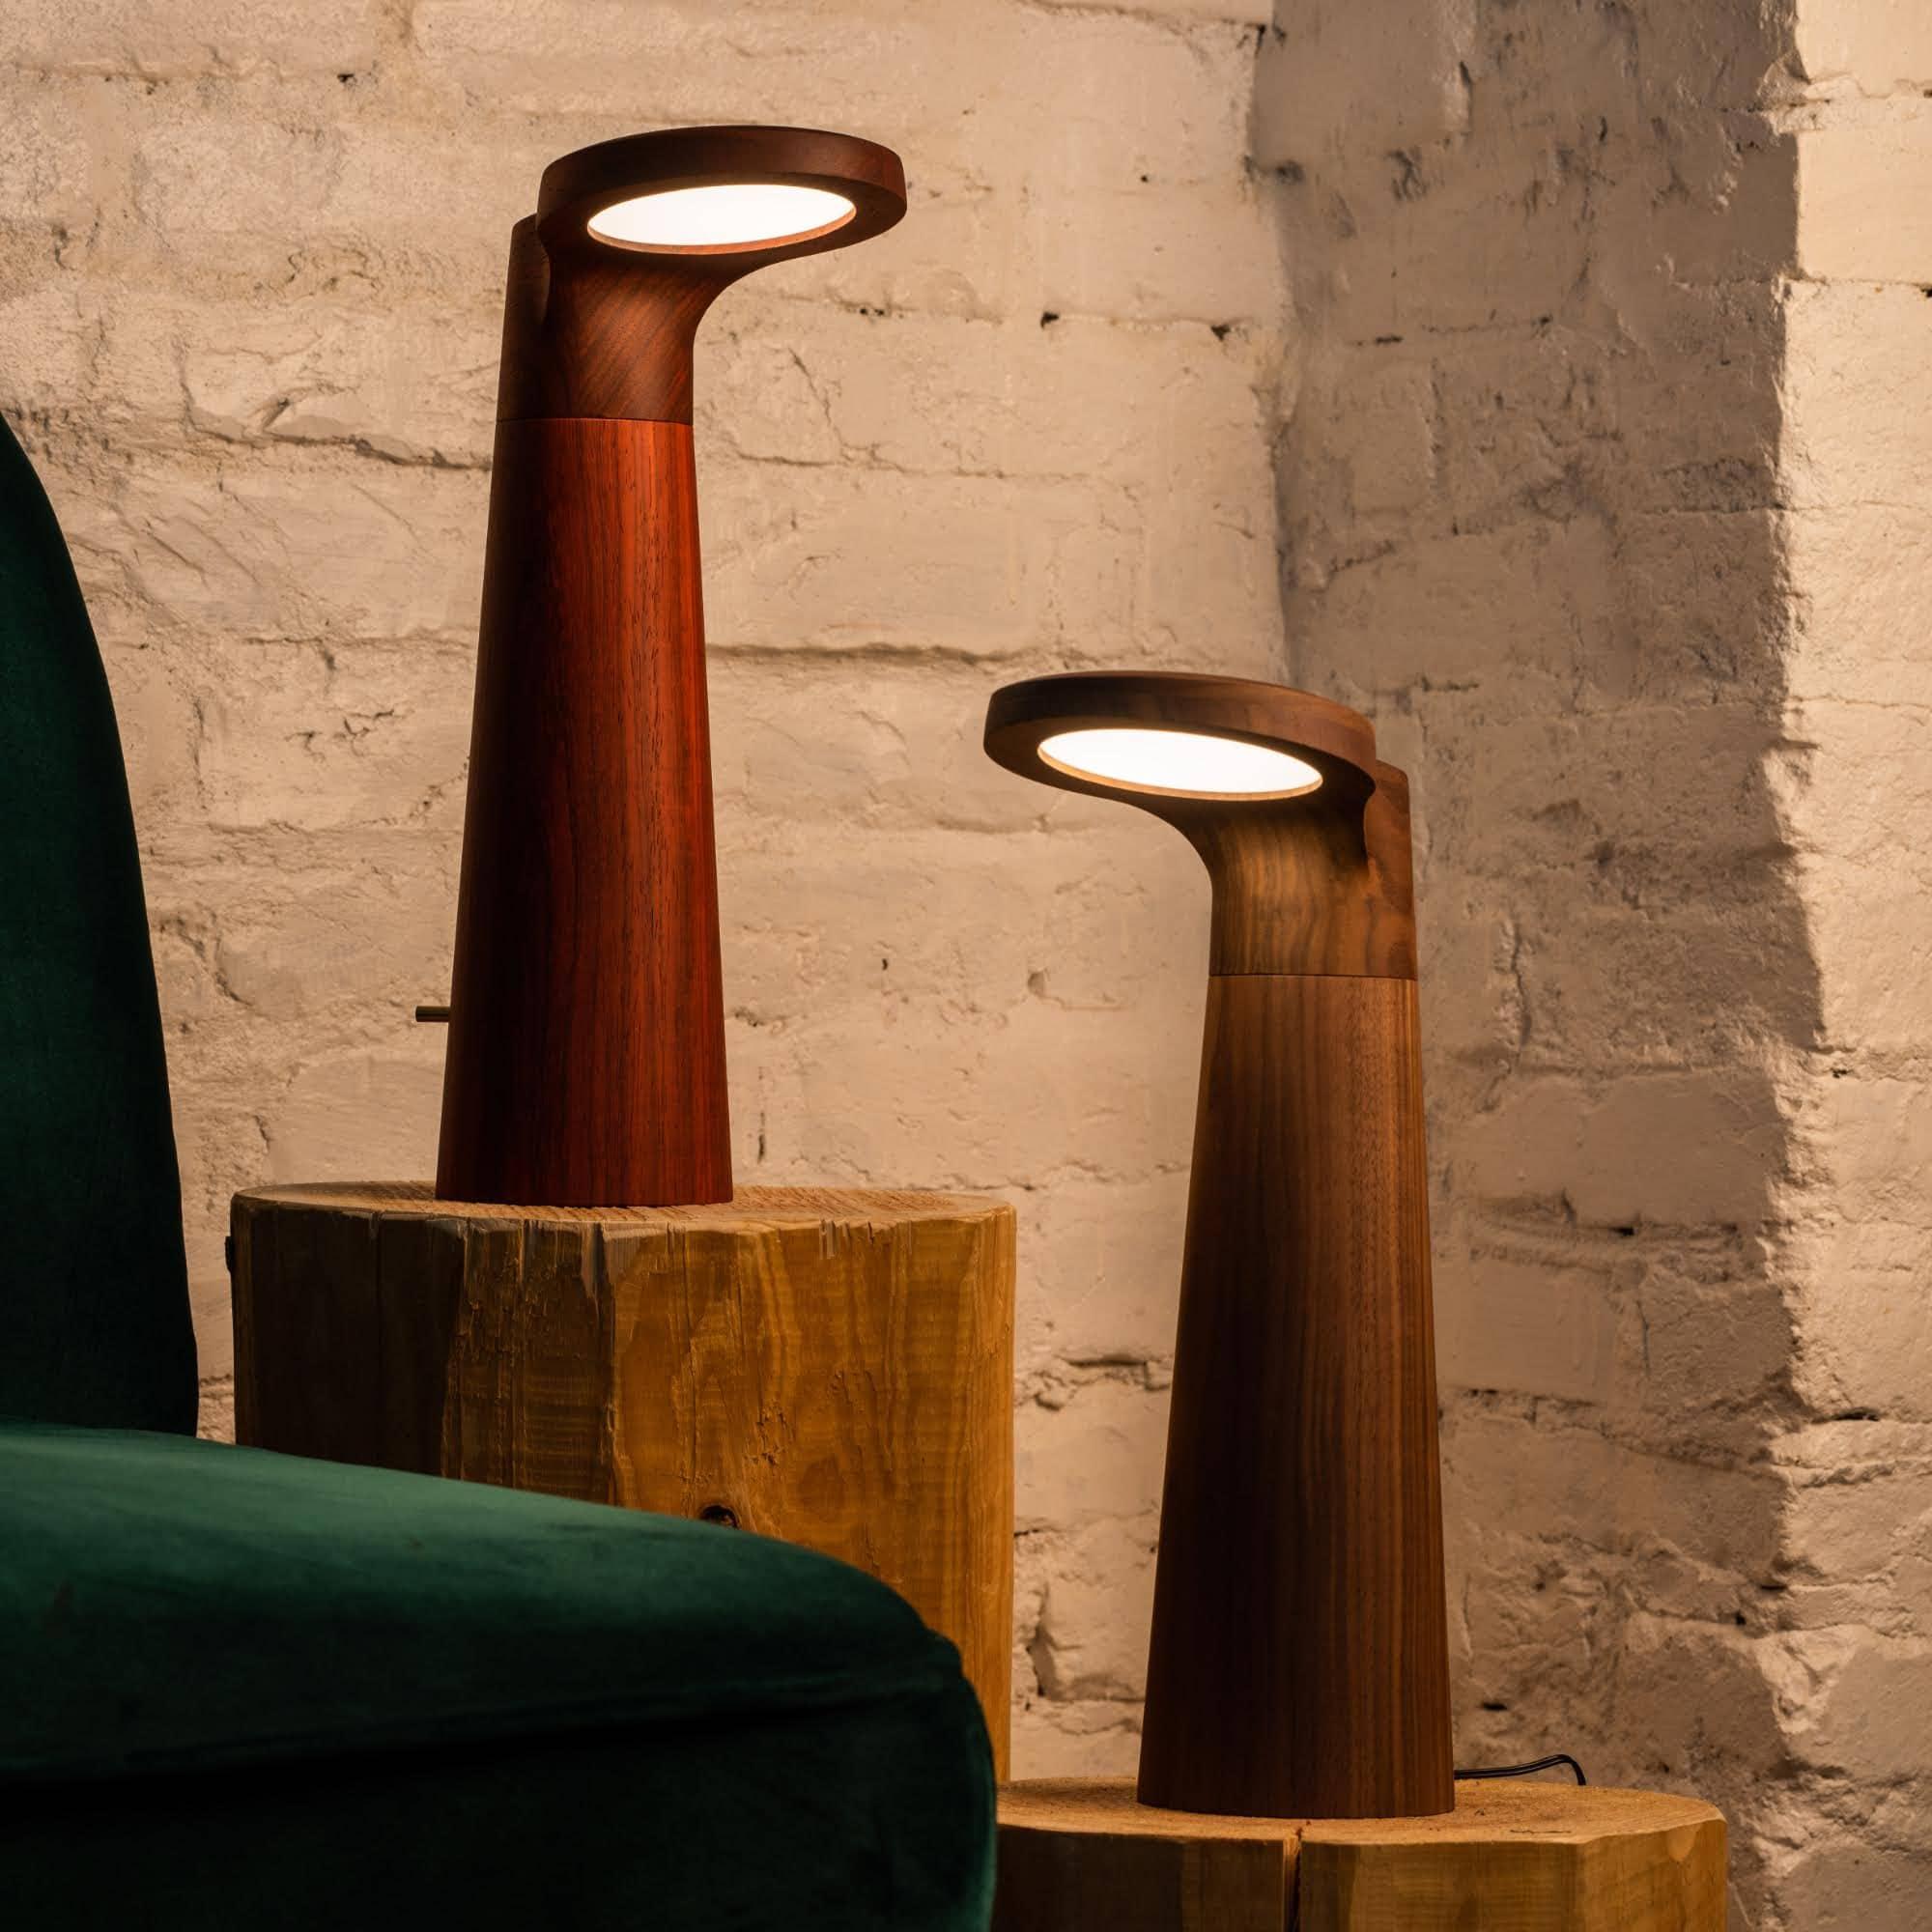 studio lamp by Isato Prugger   OLEDWorks